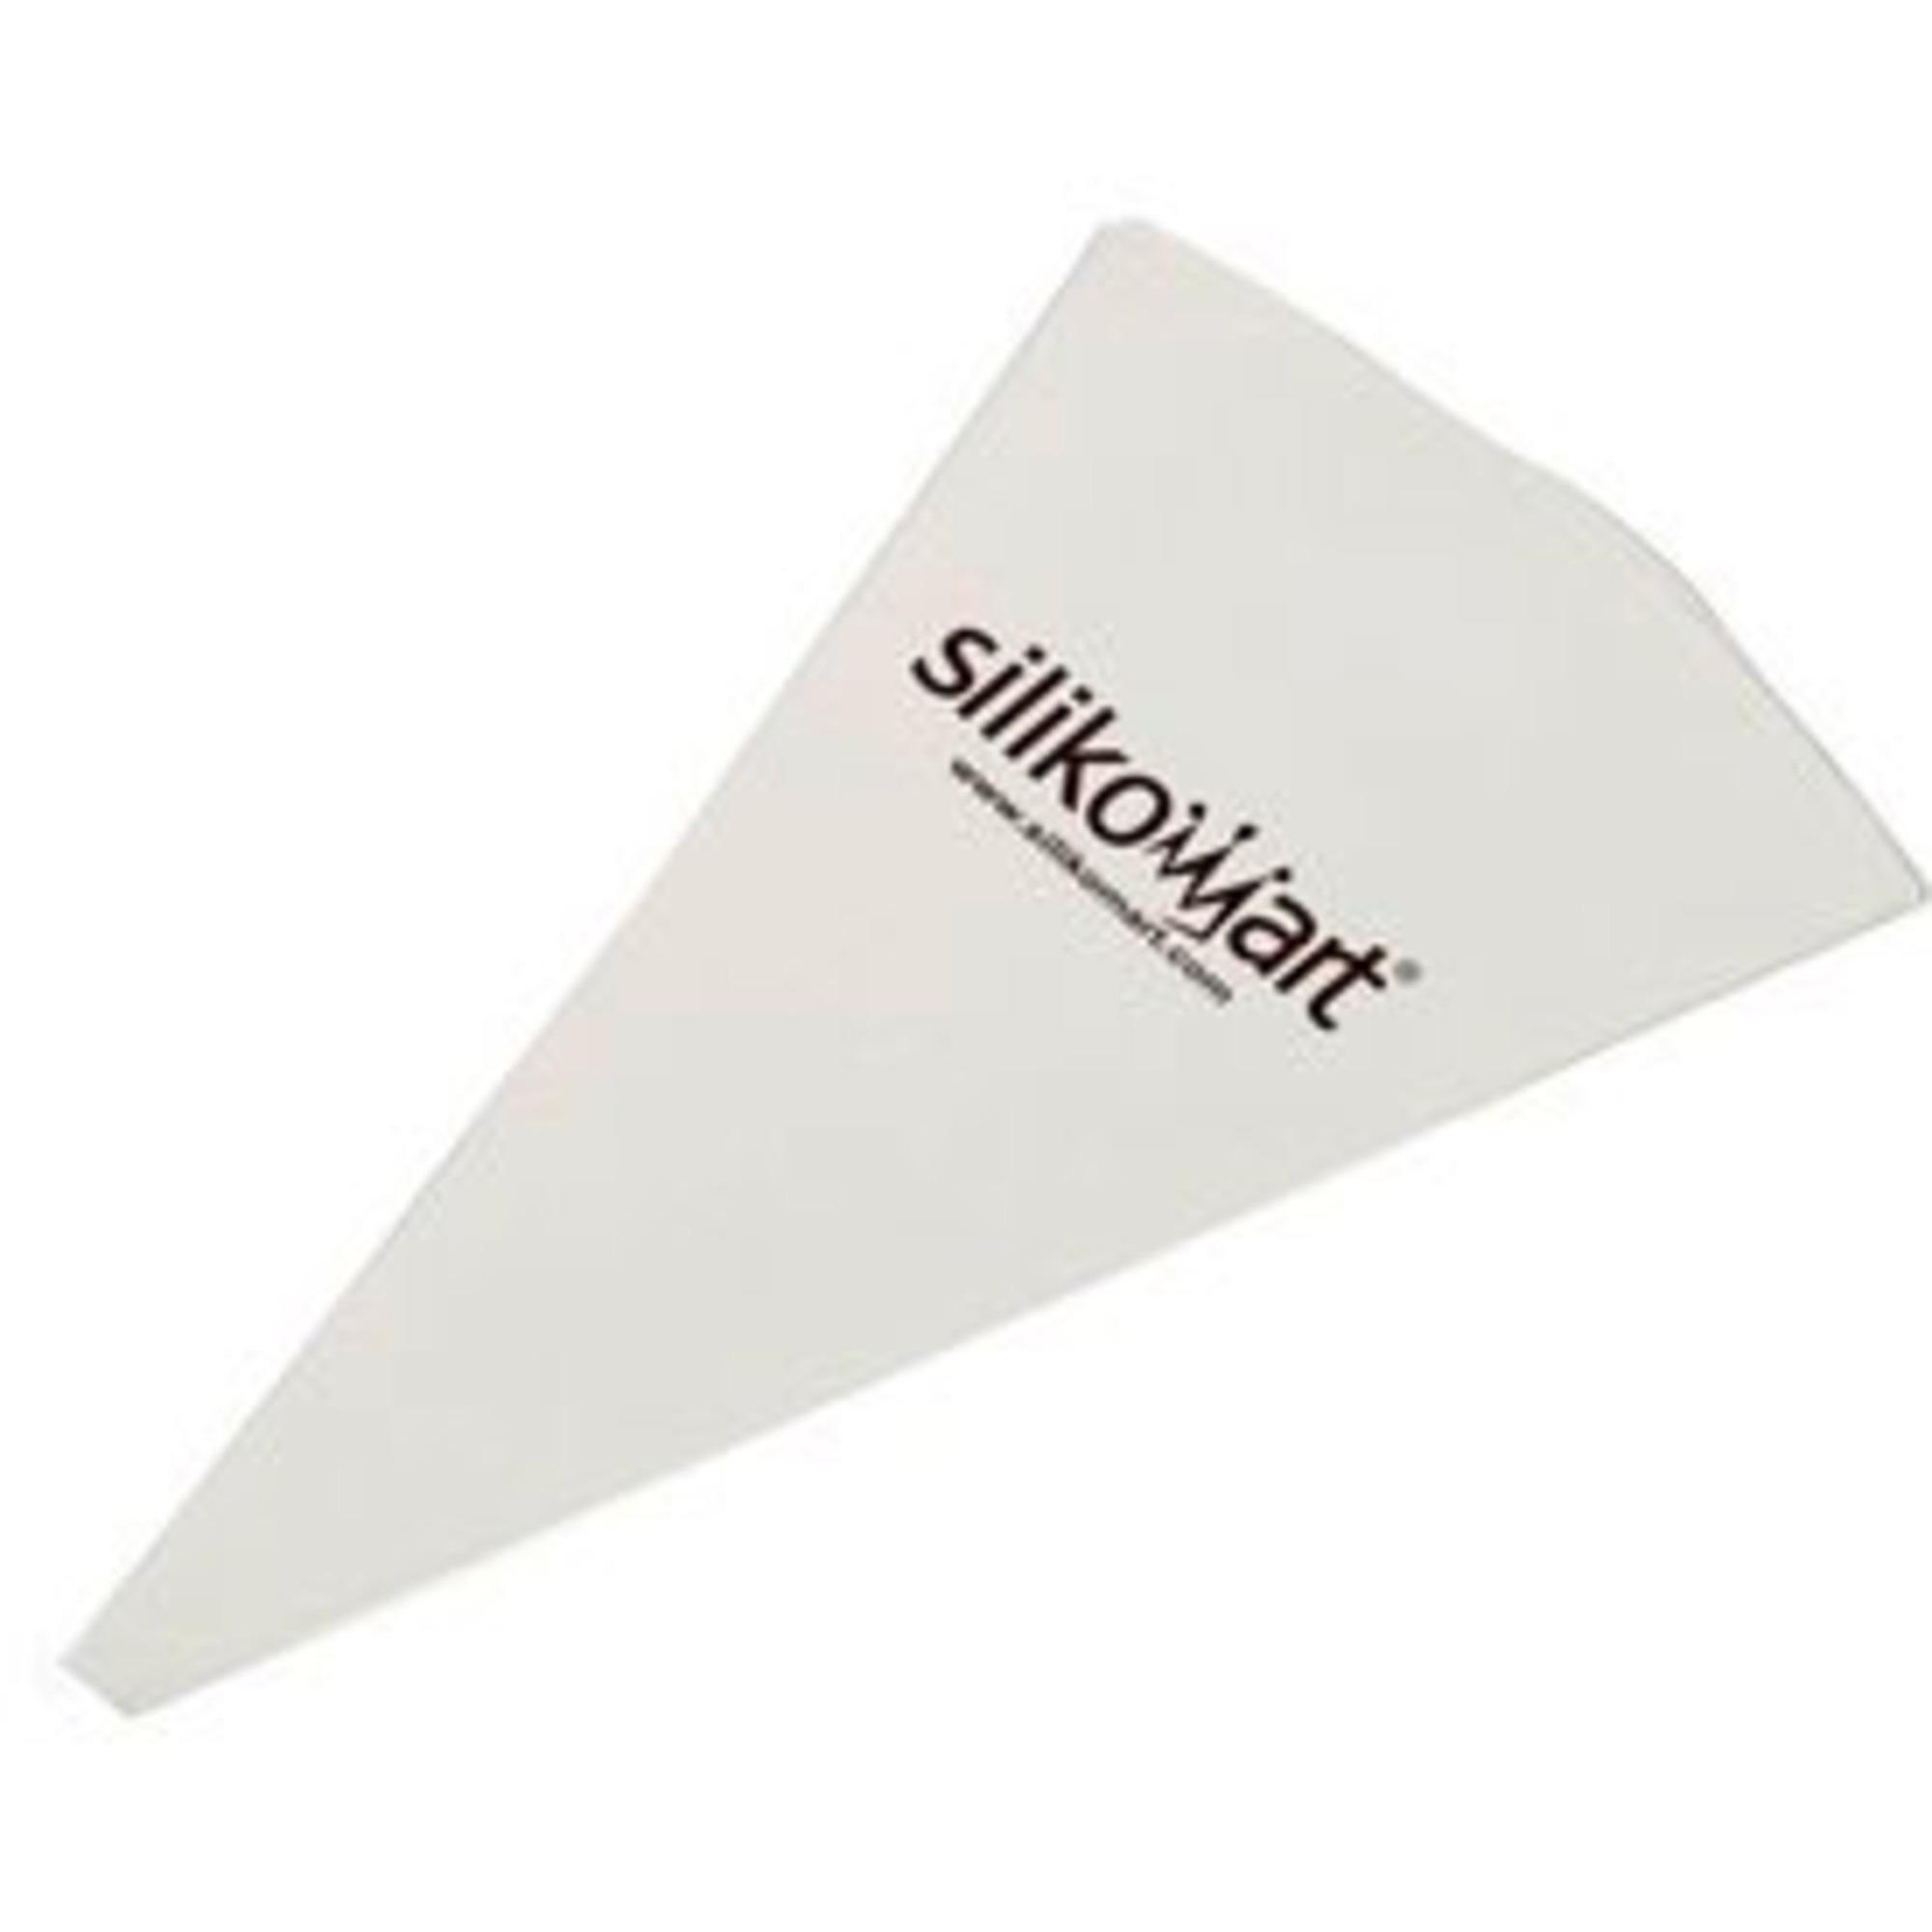 Silikomart Spritspåse i Silikon